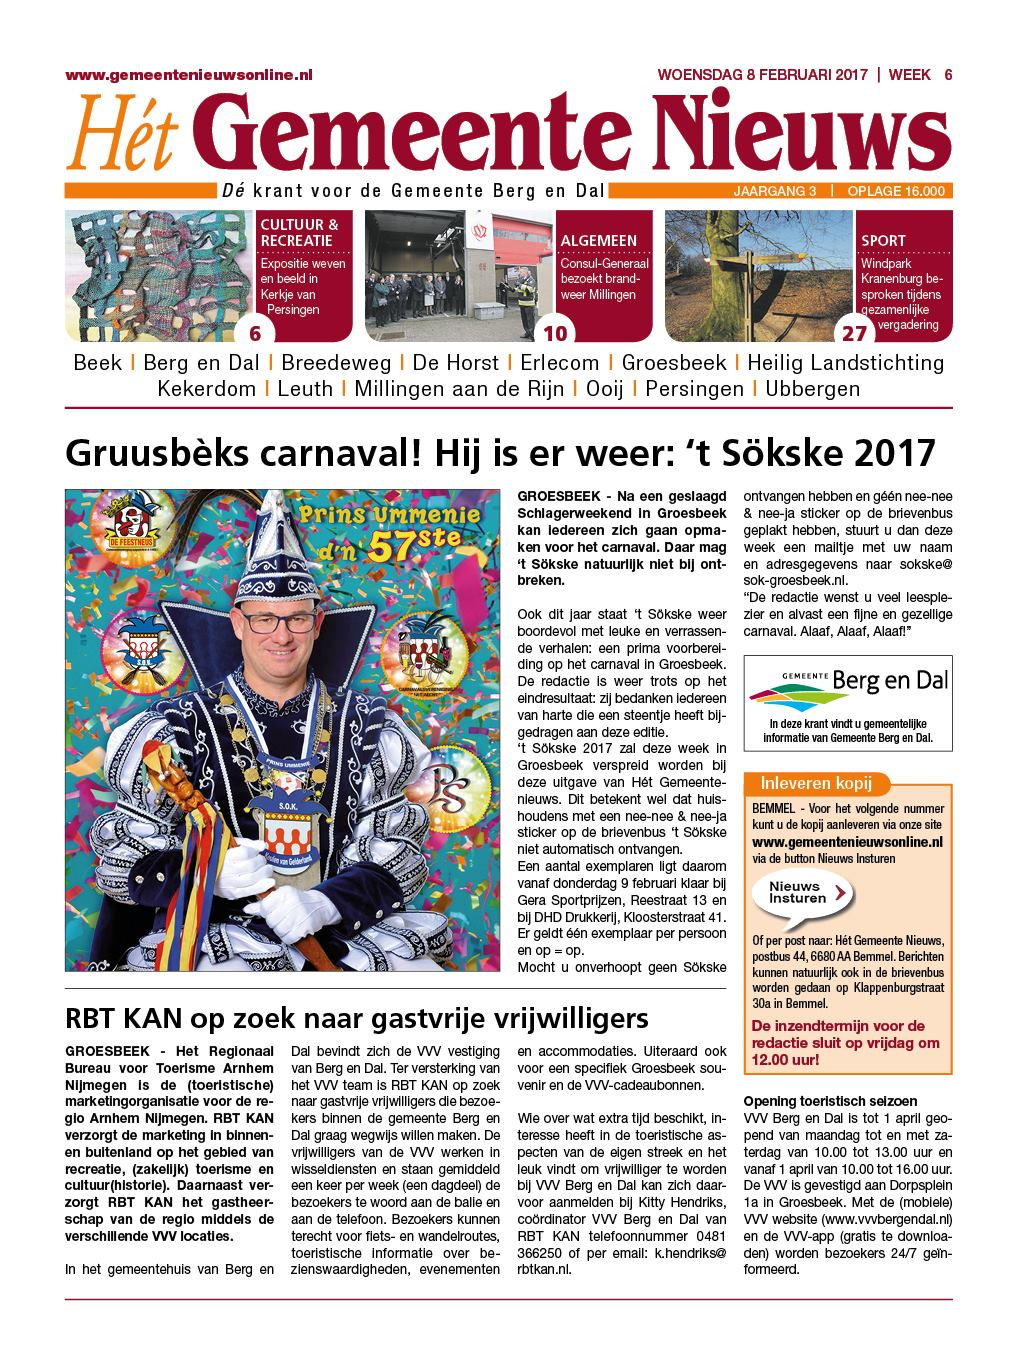 edf9551274c GN Berg en Dal Heumen Mook 8 februari 2017